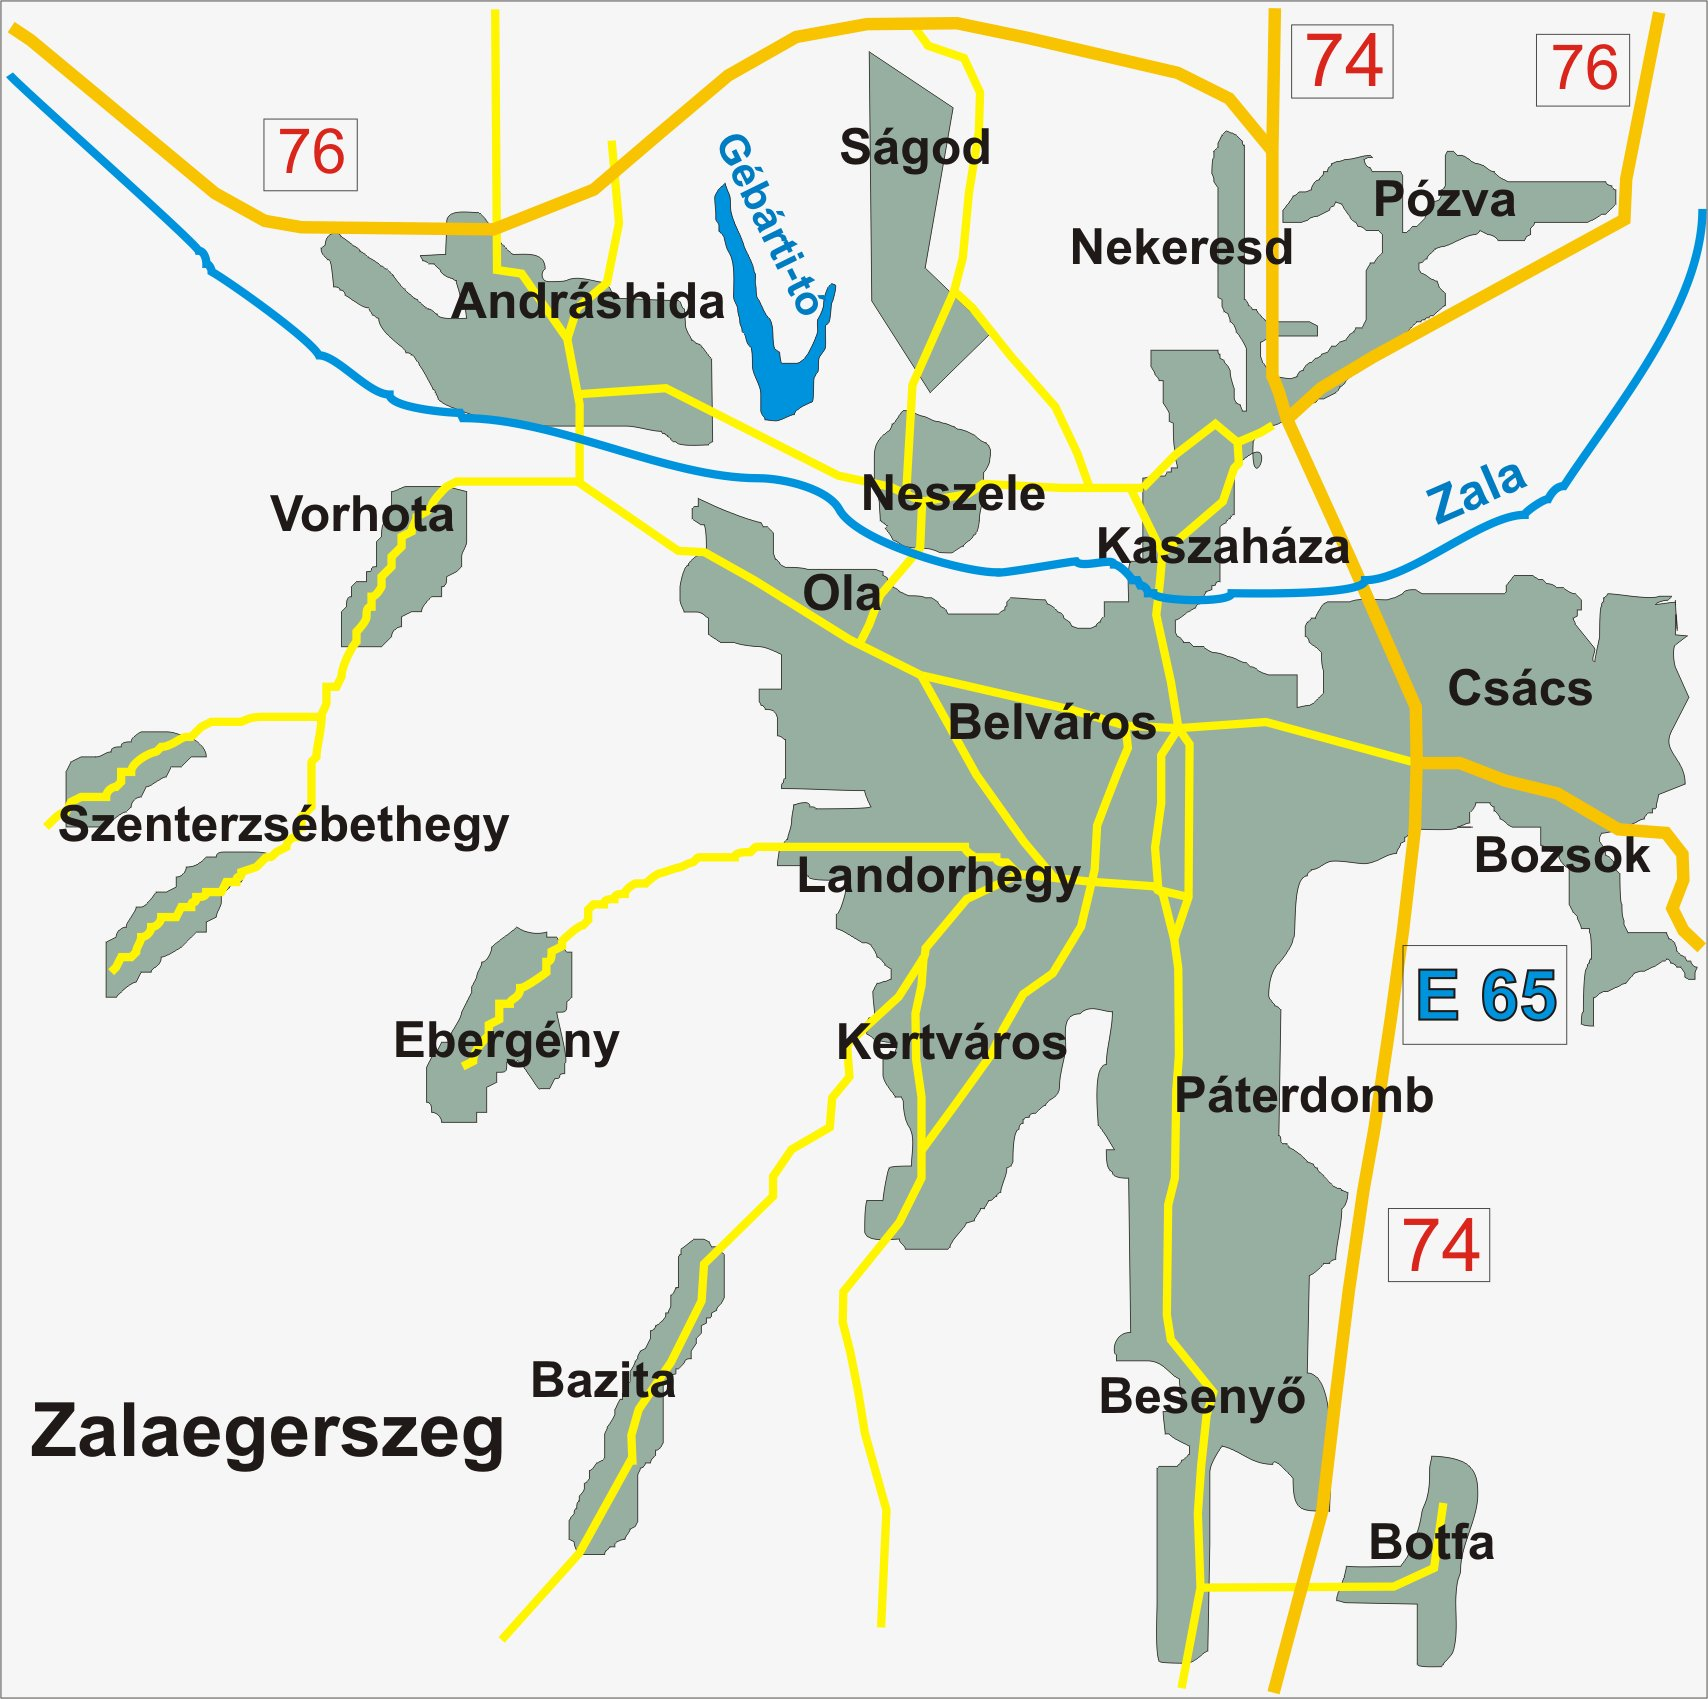 zalaegerszeg térkép Zalaegerszeg térkép [Digitális Képarchívum   DKA 018881] zalaegerszeg térkép